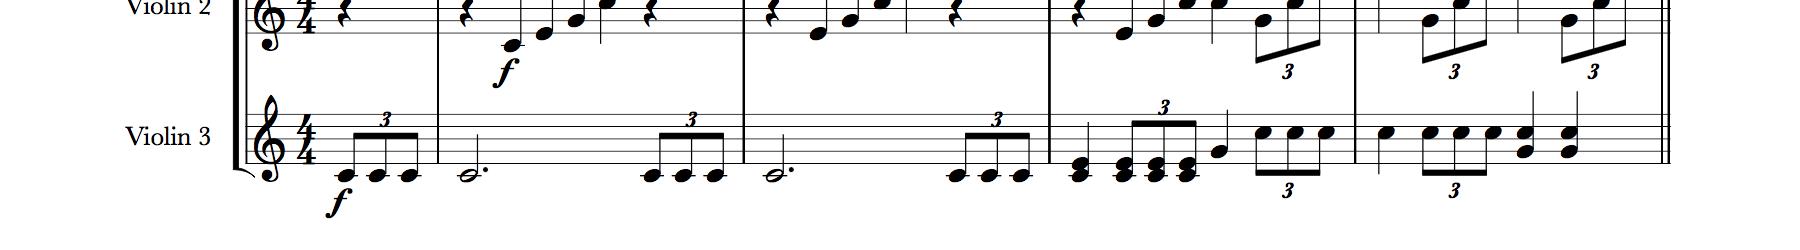 Mendelssohn Wedding March (Main Theme) for Three Violins